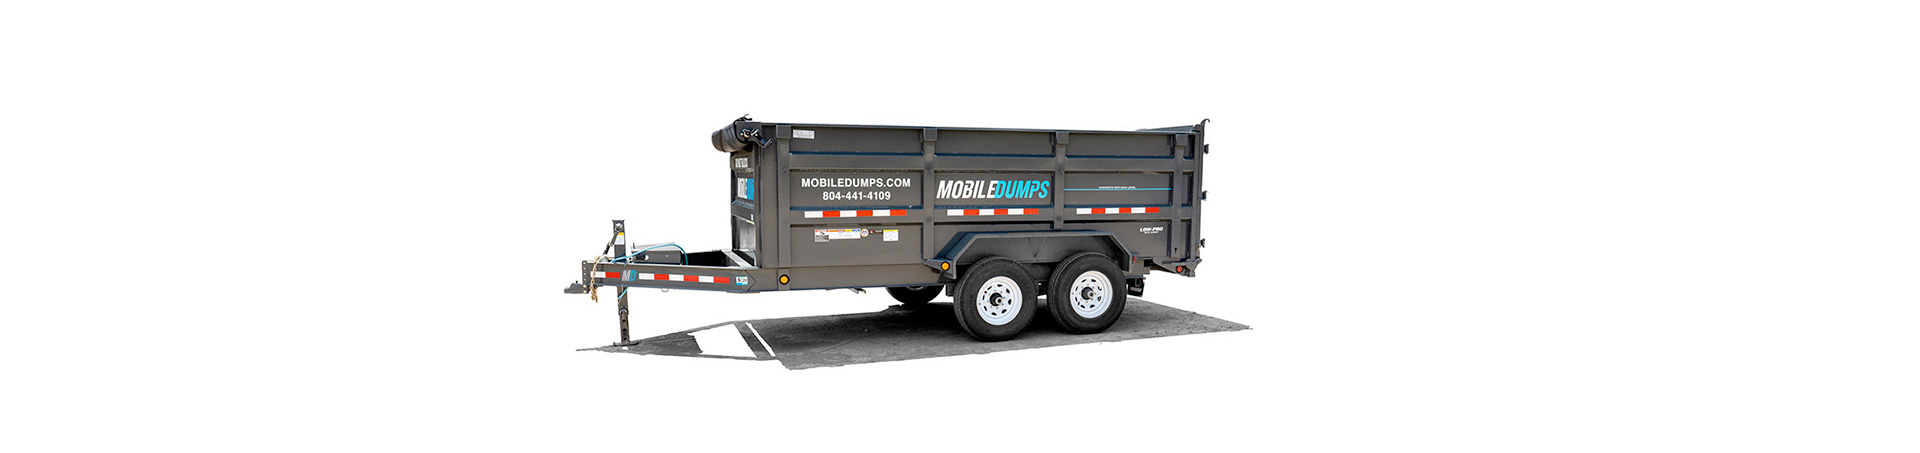 mobiledumps-trailer